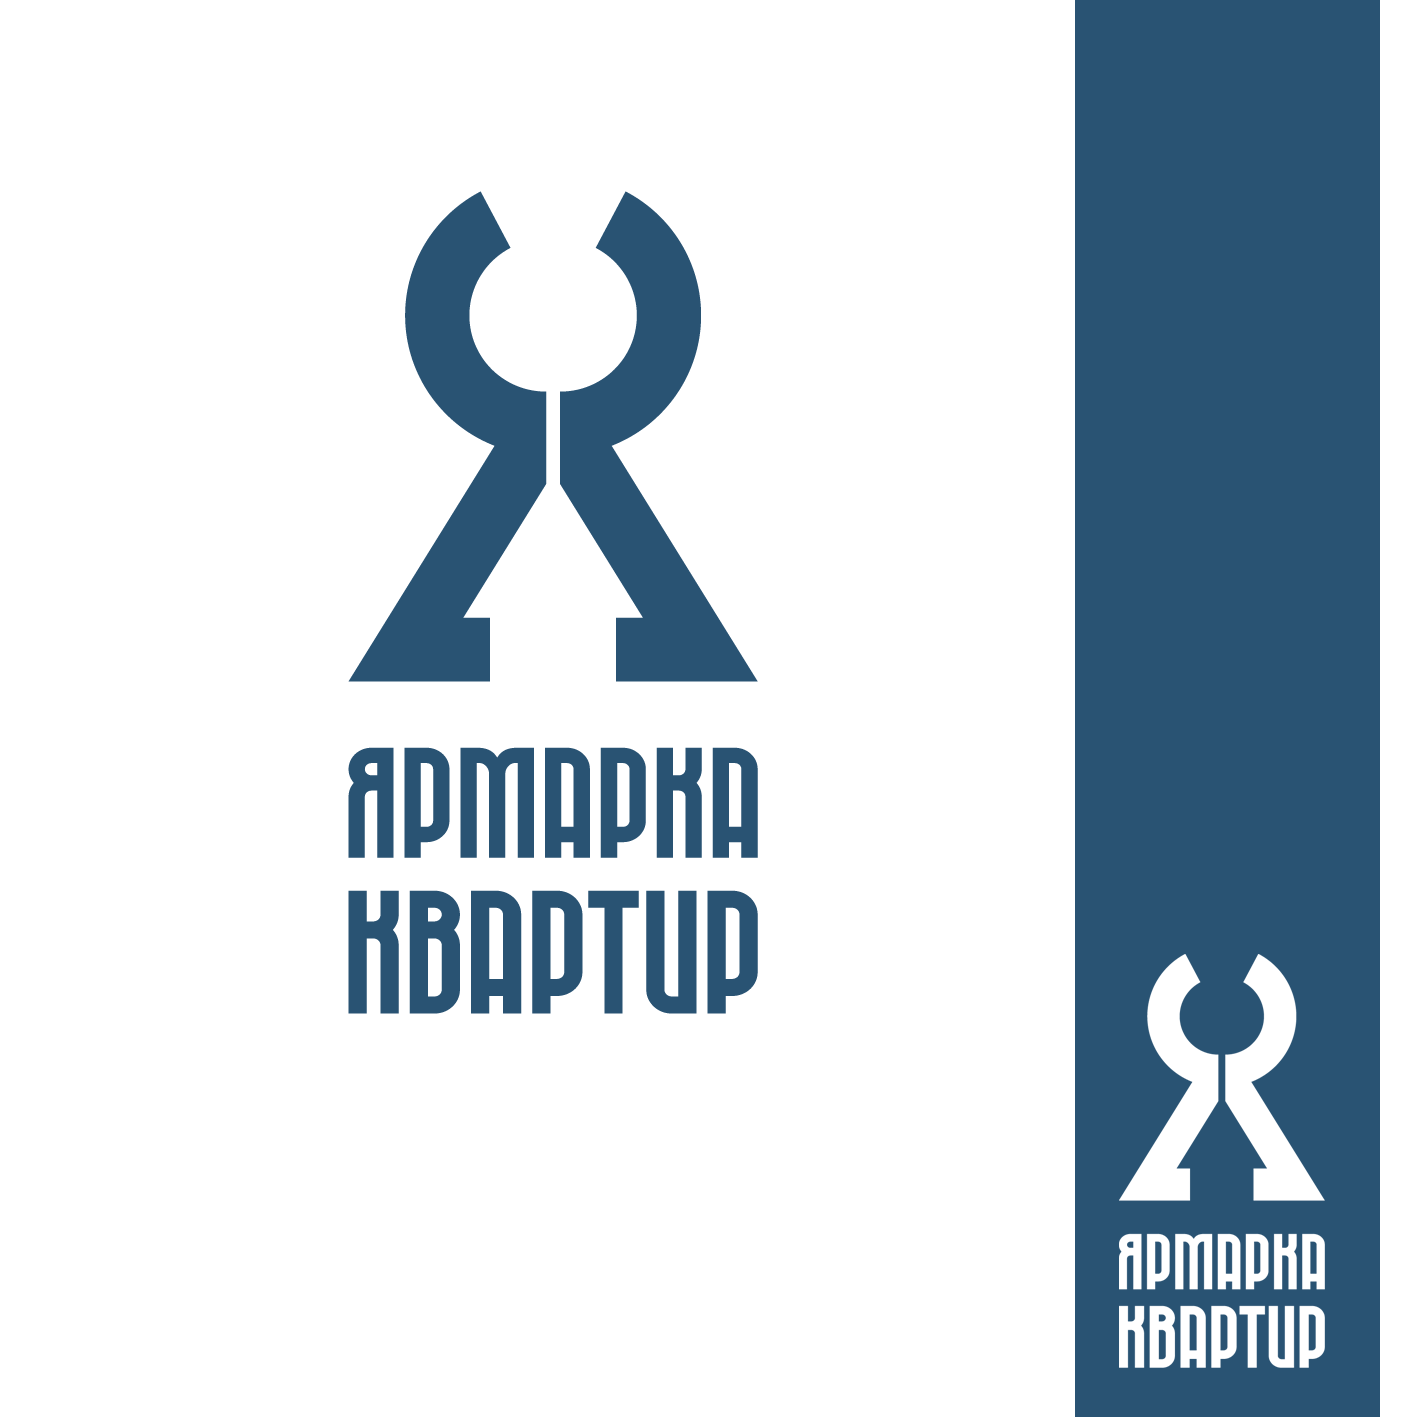 Создание логотипа, с вариантами для визитки и листовки фото f_14560047c454c0be.png